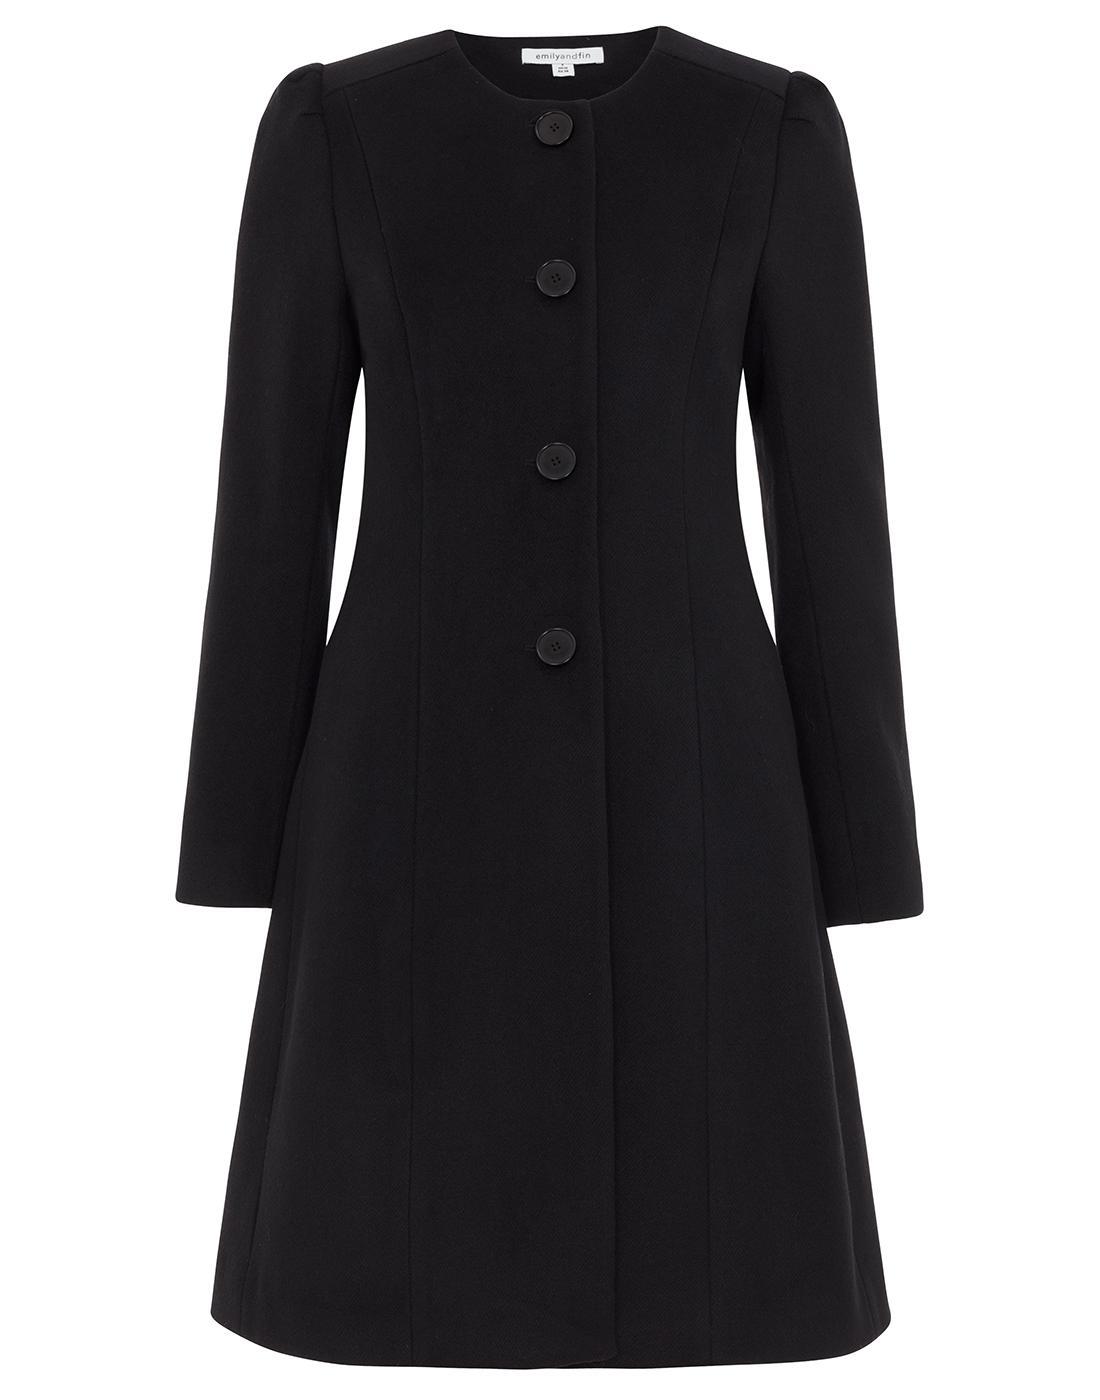 Amelia EMILY AND FIN Retro 60s Collarless Coat Blk